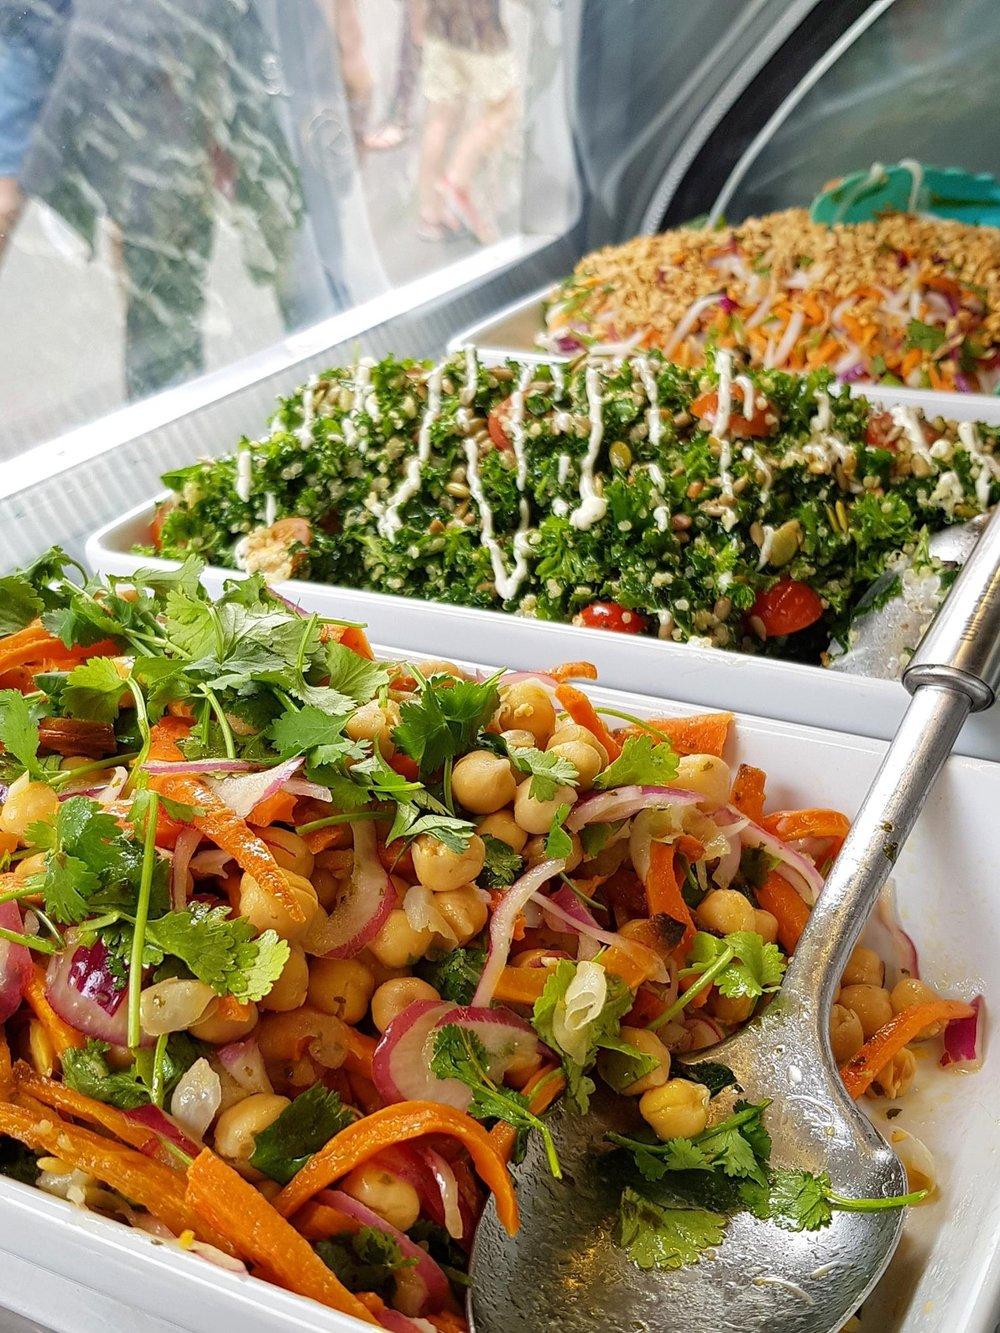 VEGE BANG BANG - Yummy vegetarian and vegan food served from a refurbished caravan